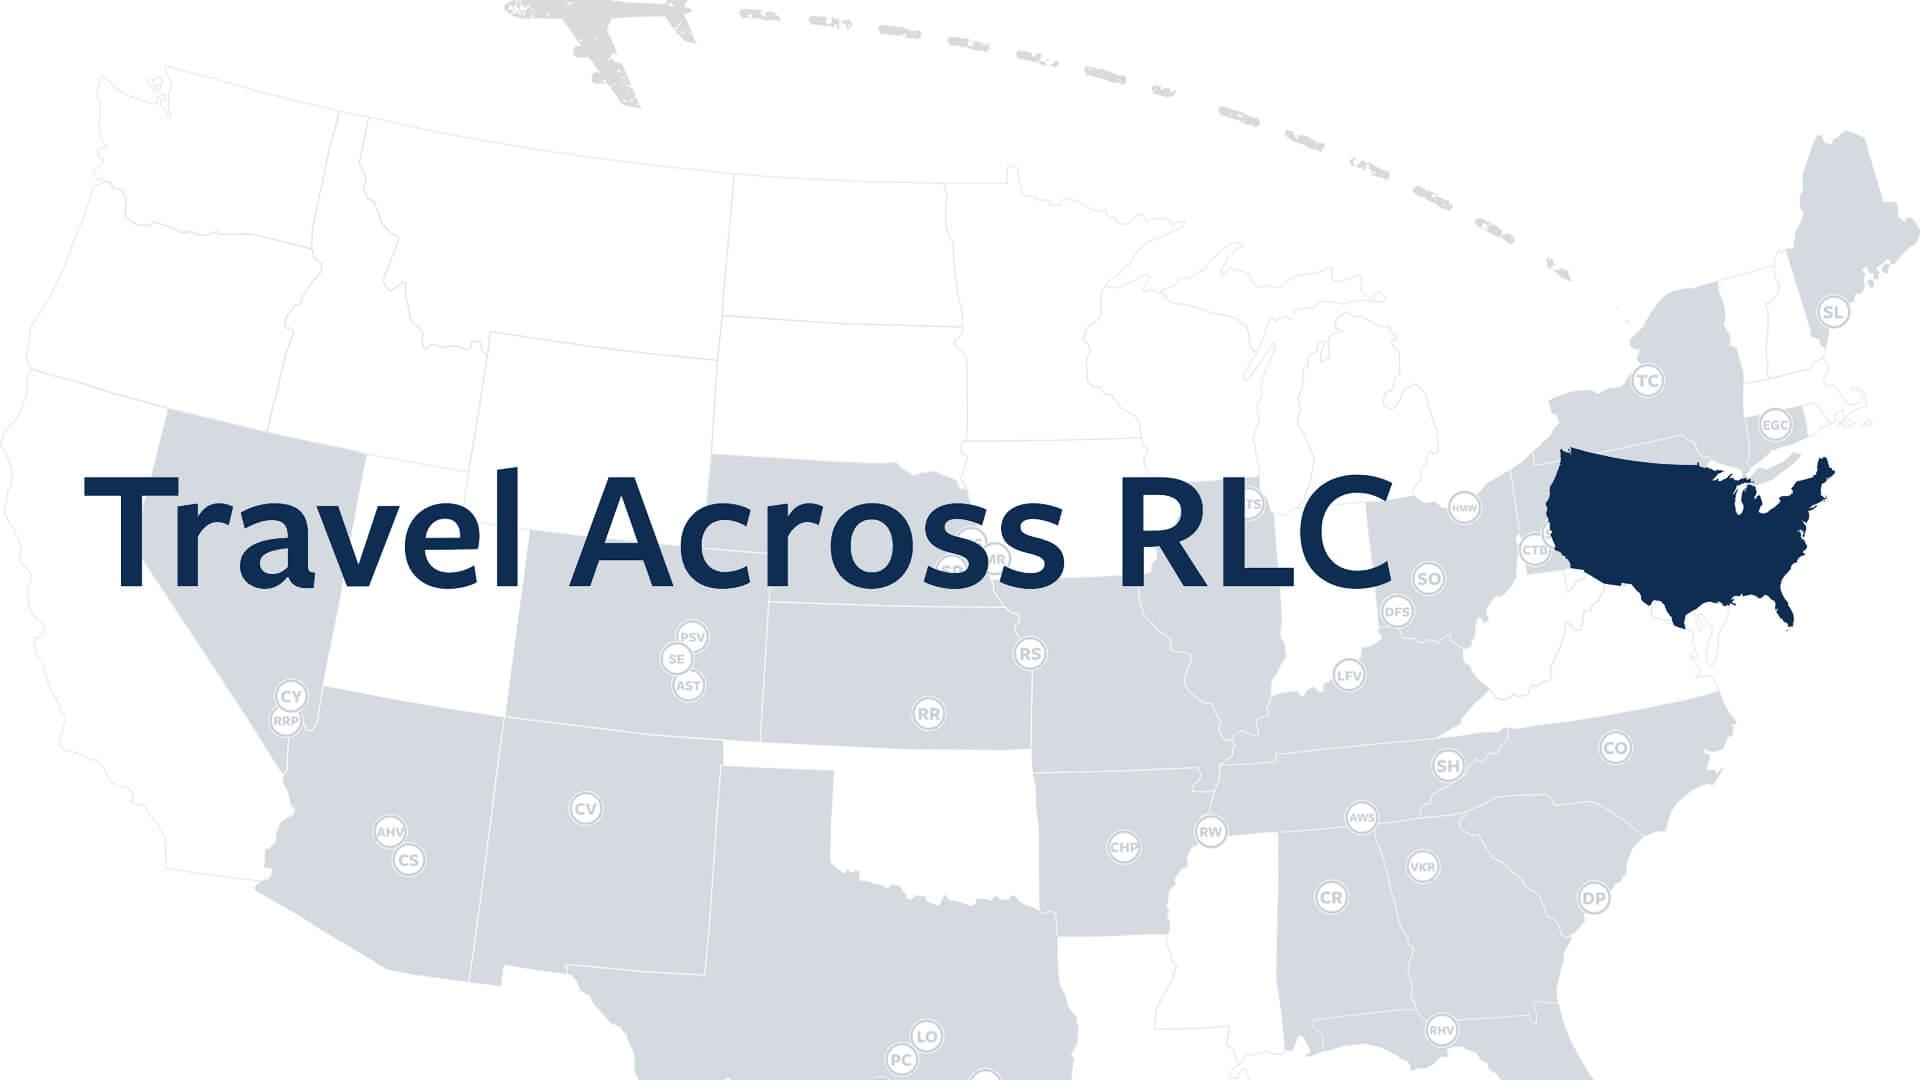 Travel Across RLC